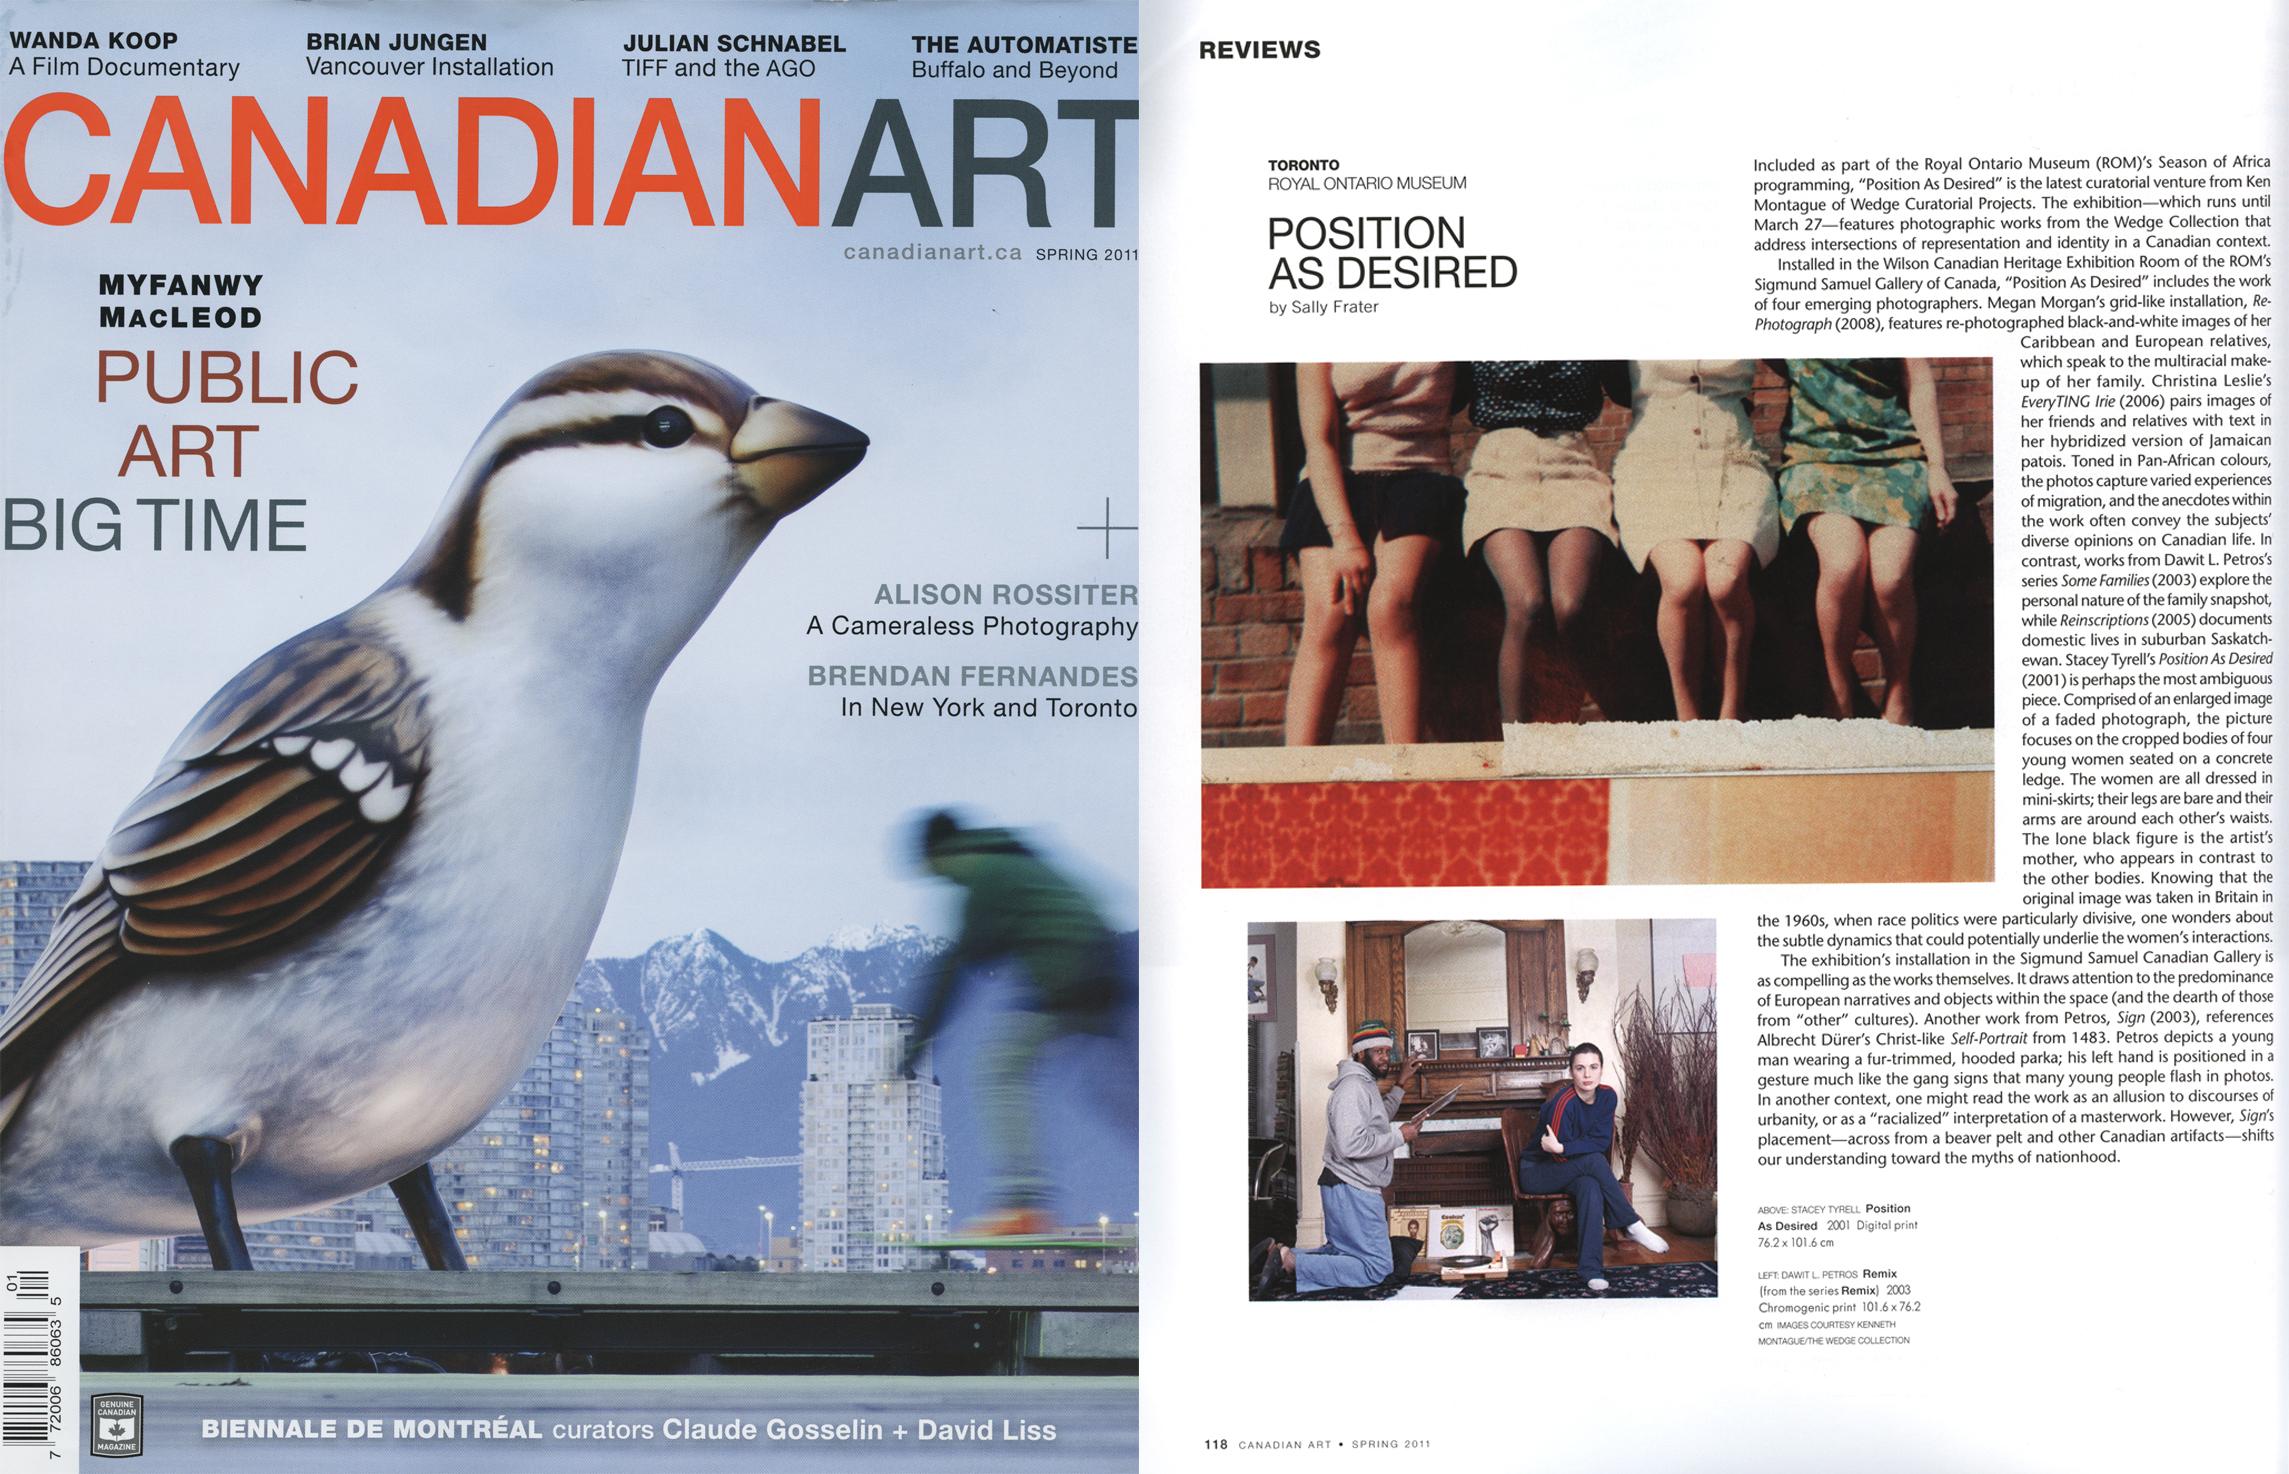 tyrell-PAD-canadian-art-2011.jpg